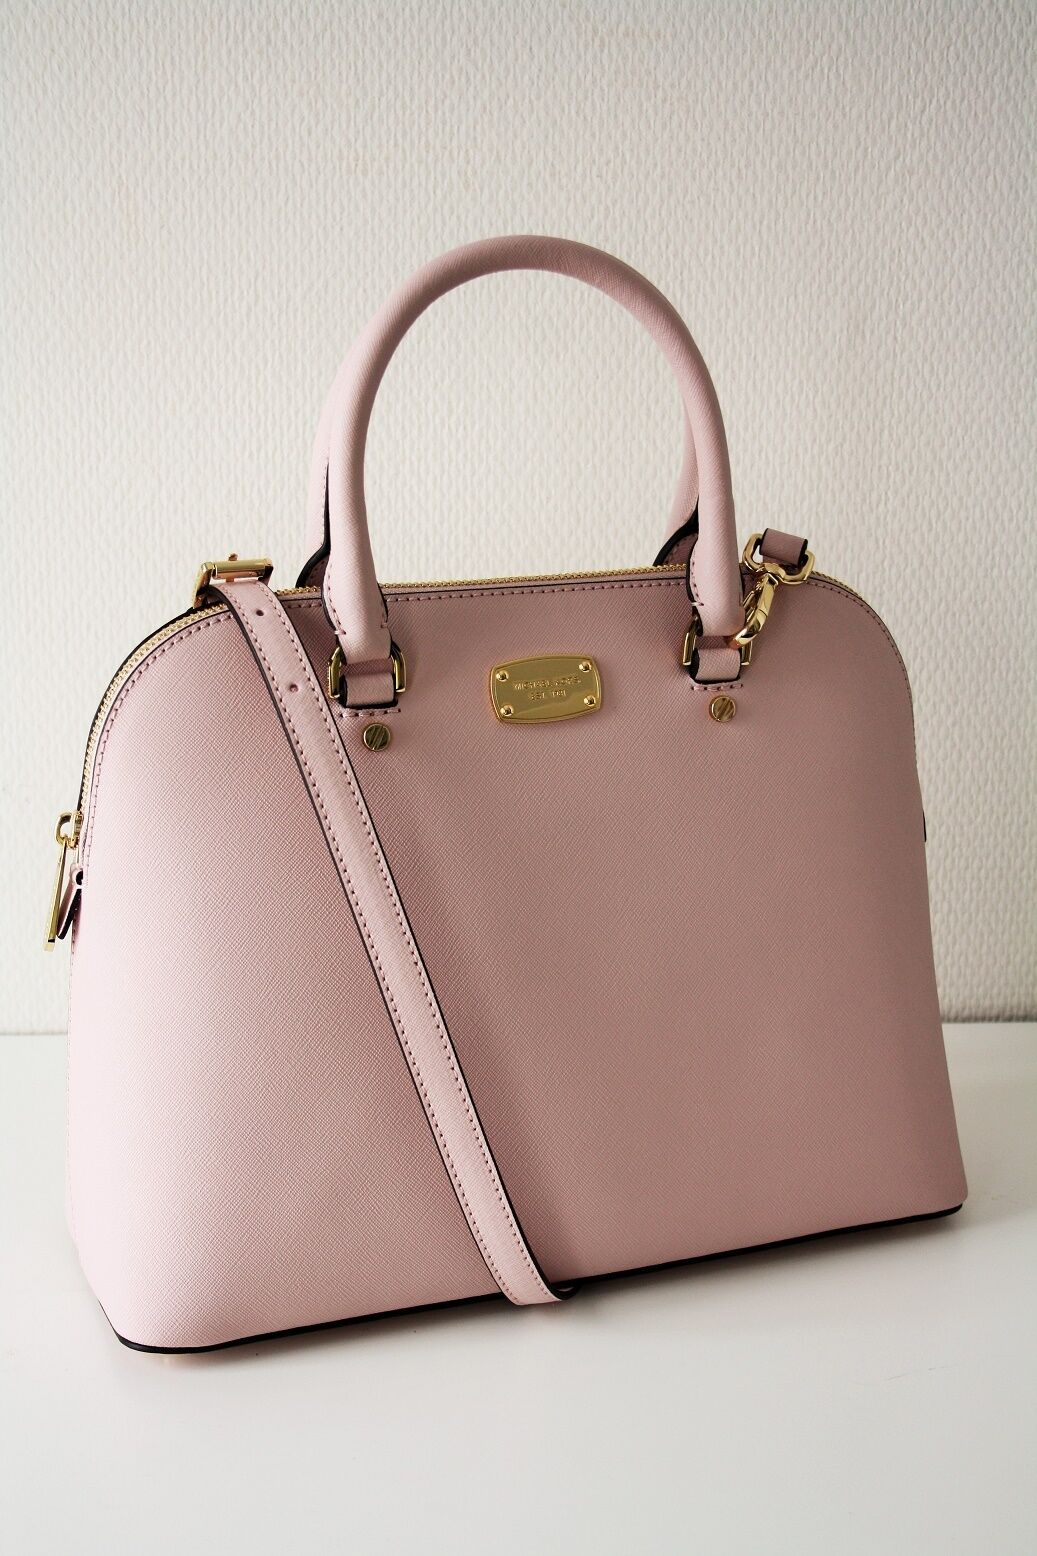 04e8768004f9 ... real item 2 michael kors cindy lg dome satchel saffiano leather blossom  rose michael kors cindy